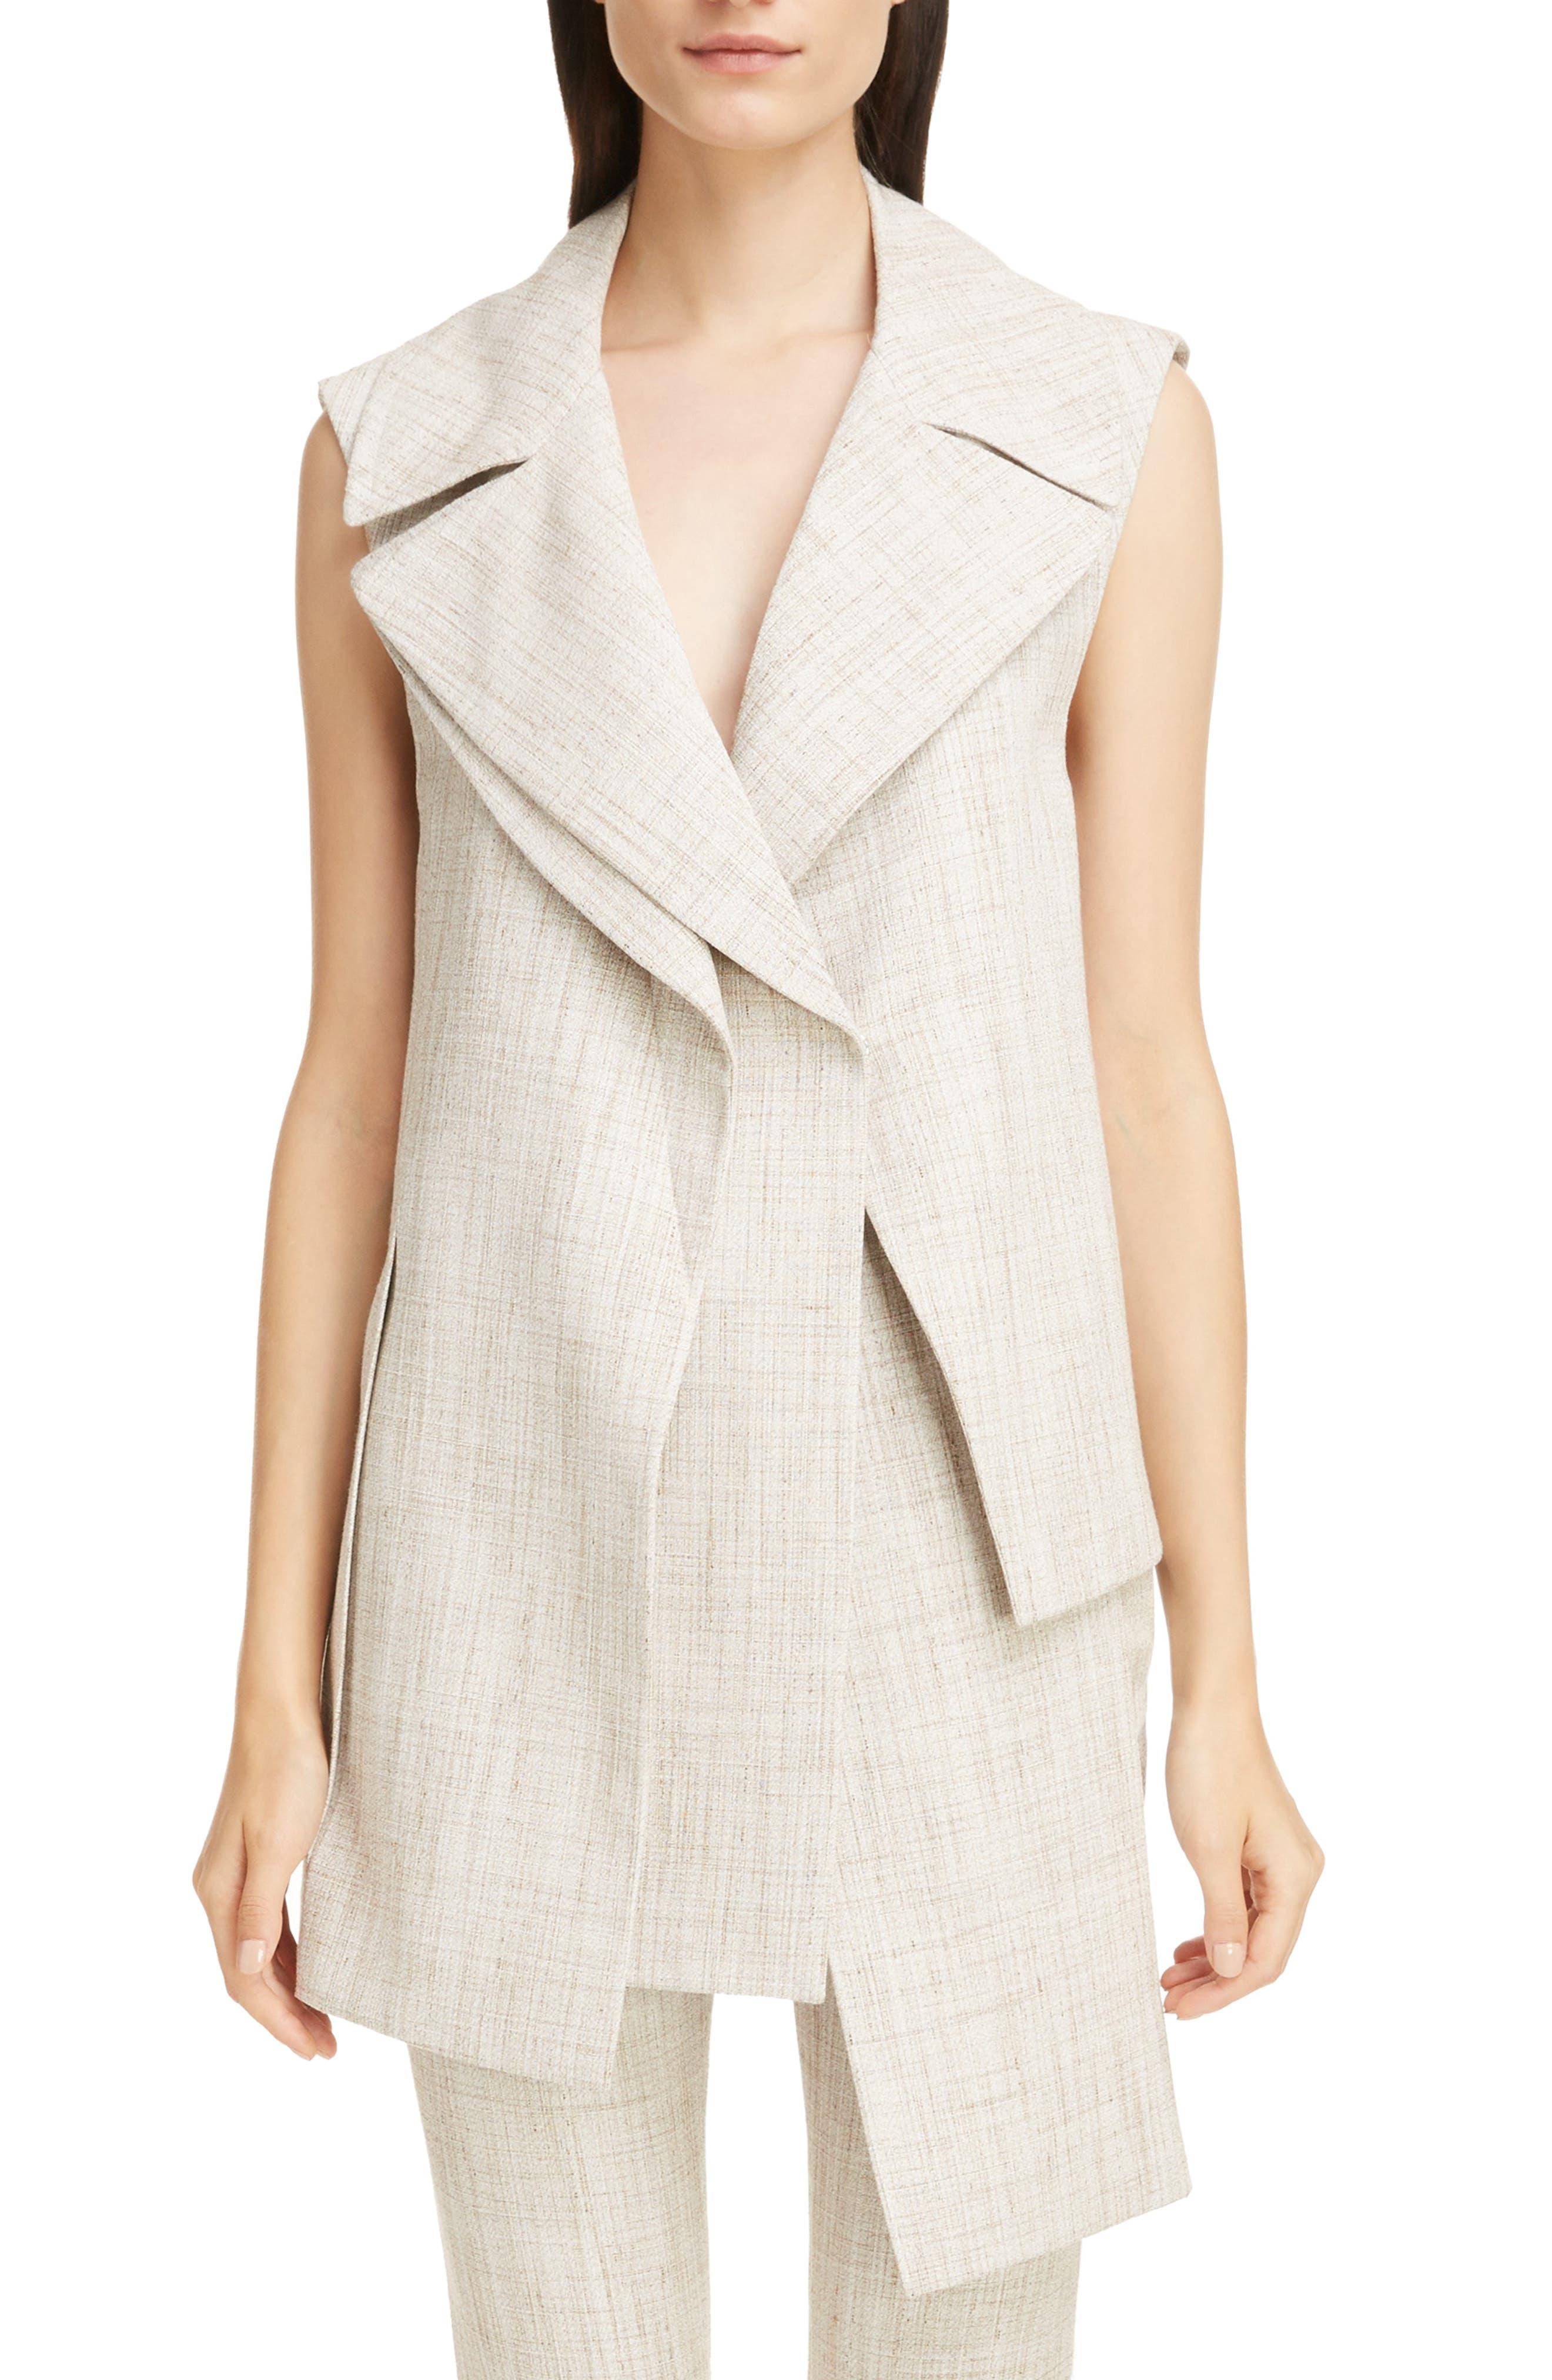 Victoria Beckham Asymmetrical Tweed Vest